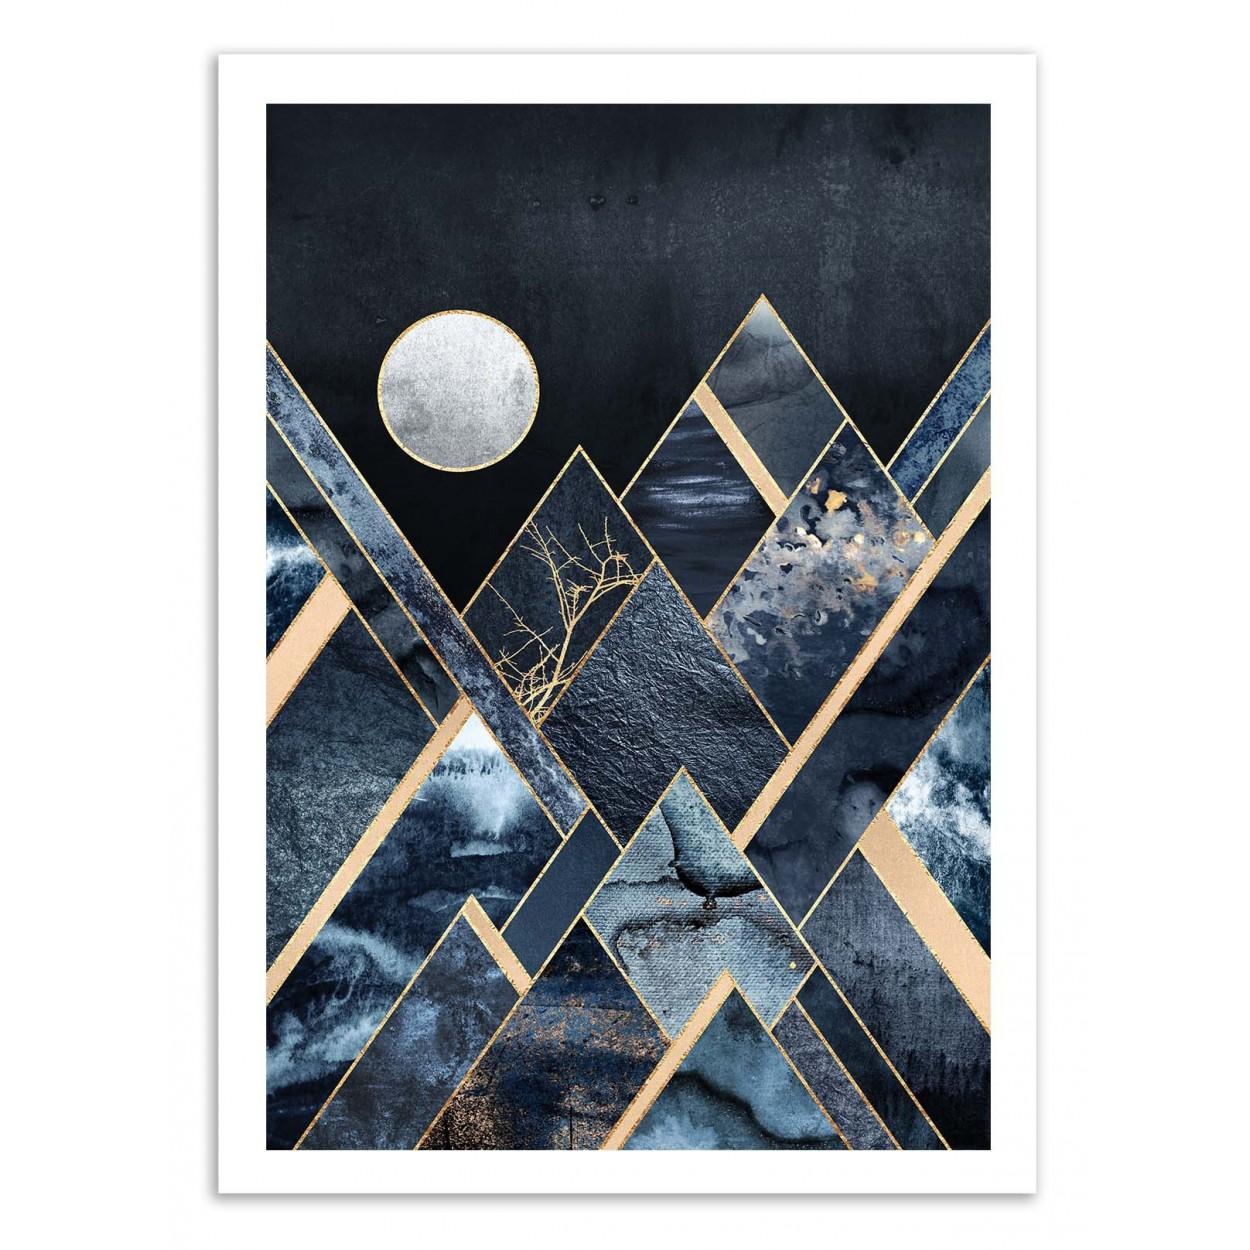 SMOCKY MOUNTAINS - Affiche d'art 50 x 70 cm